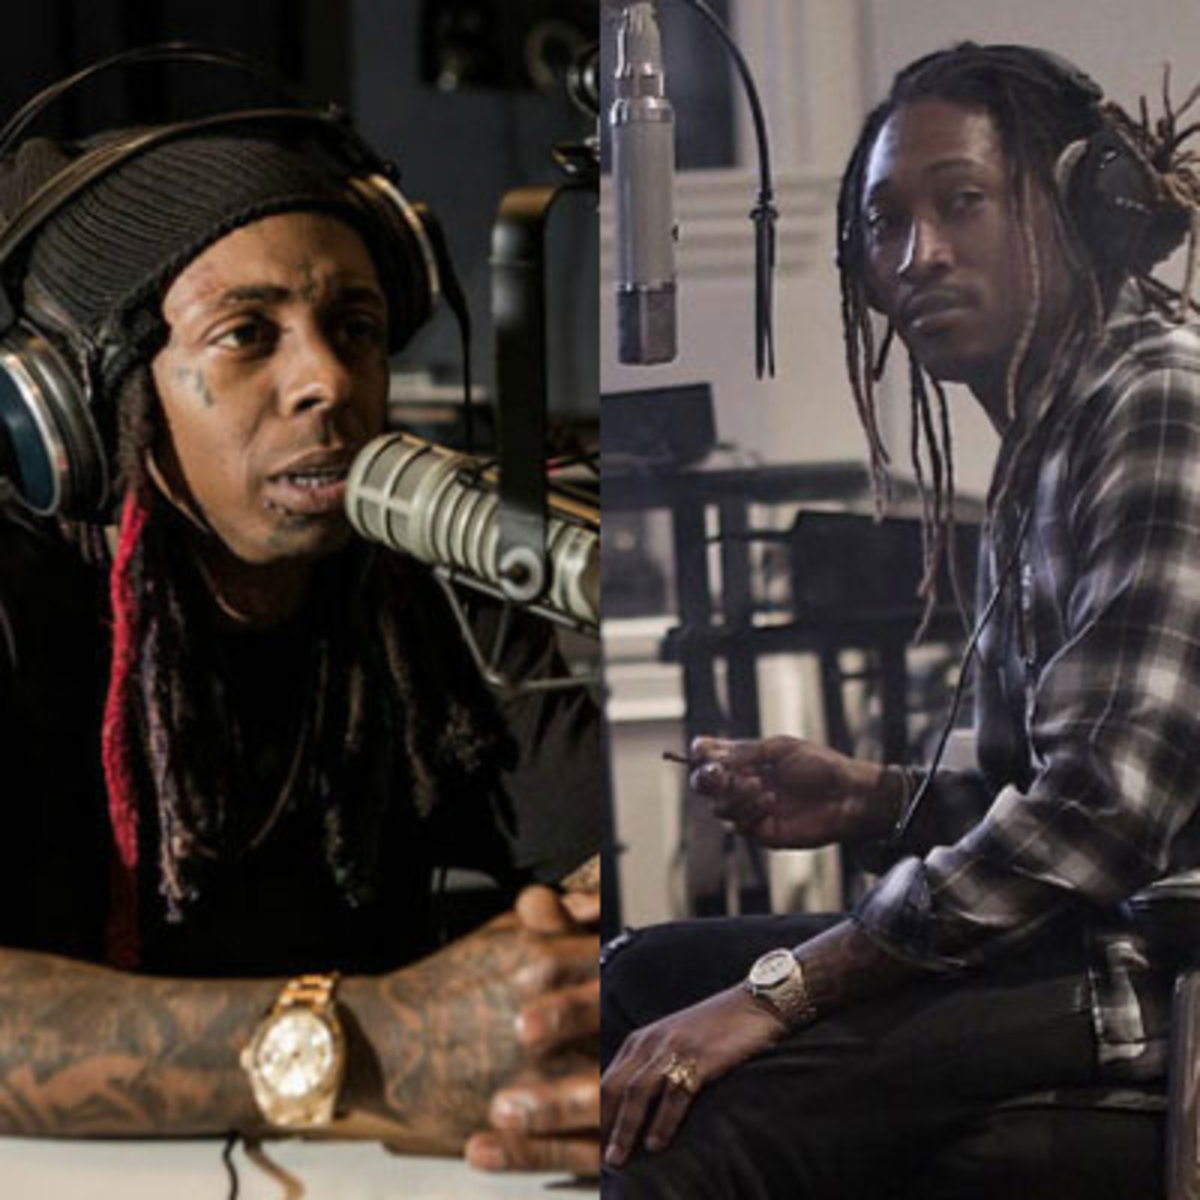 rappers-quality-quantity-debate.jpg